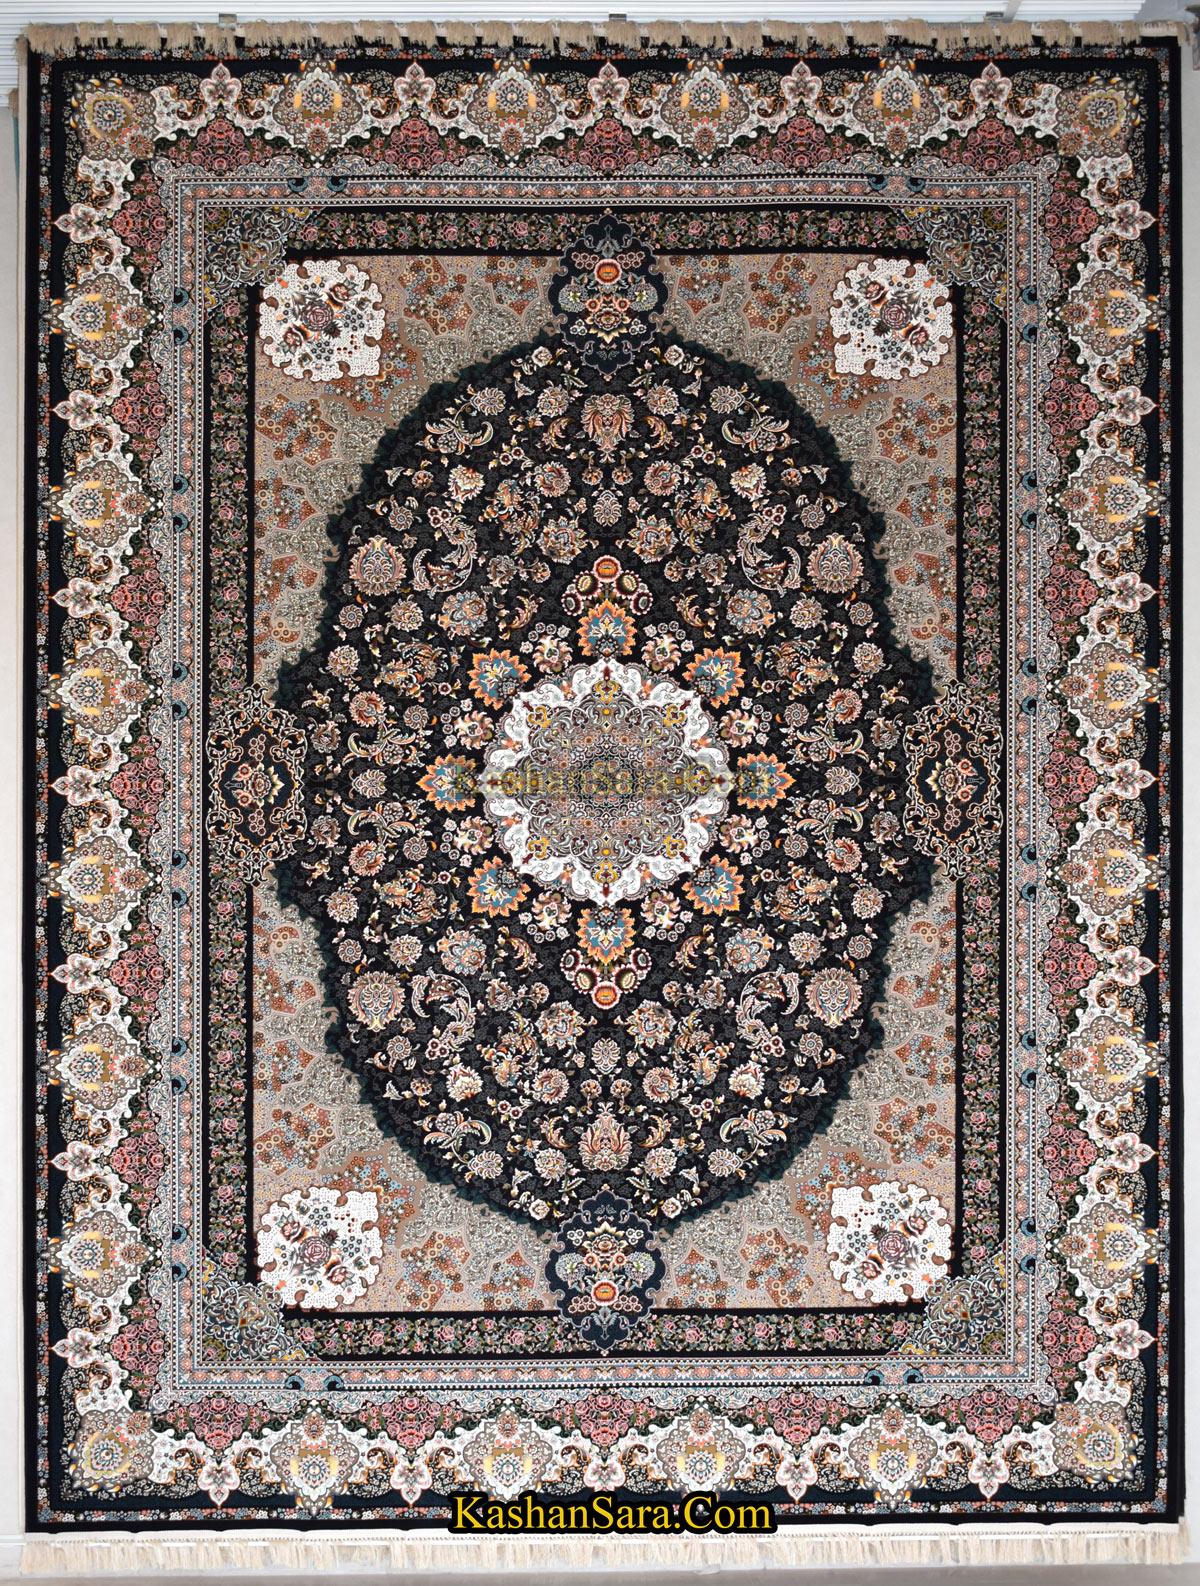 فرش ۱۲۰۰ شانه نقشه نامیان